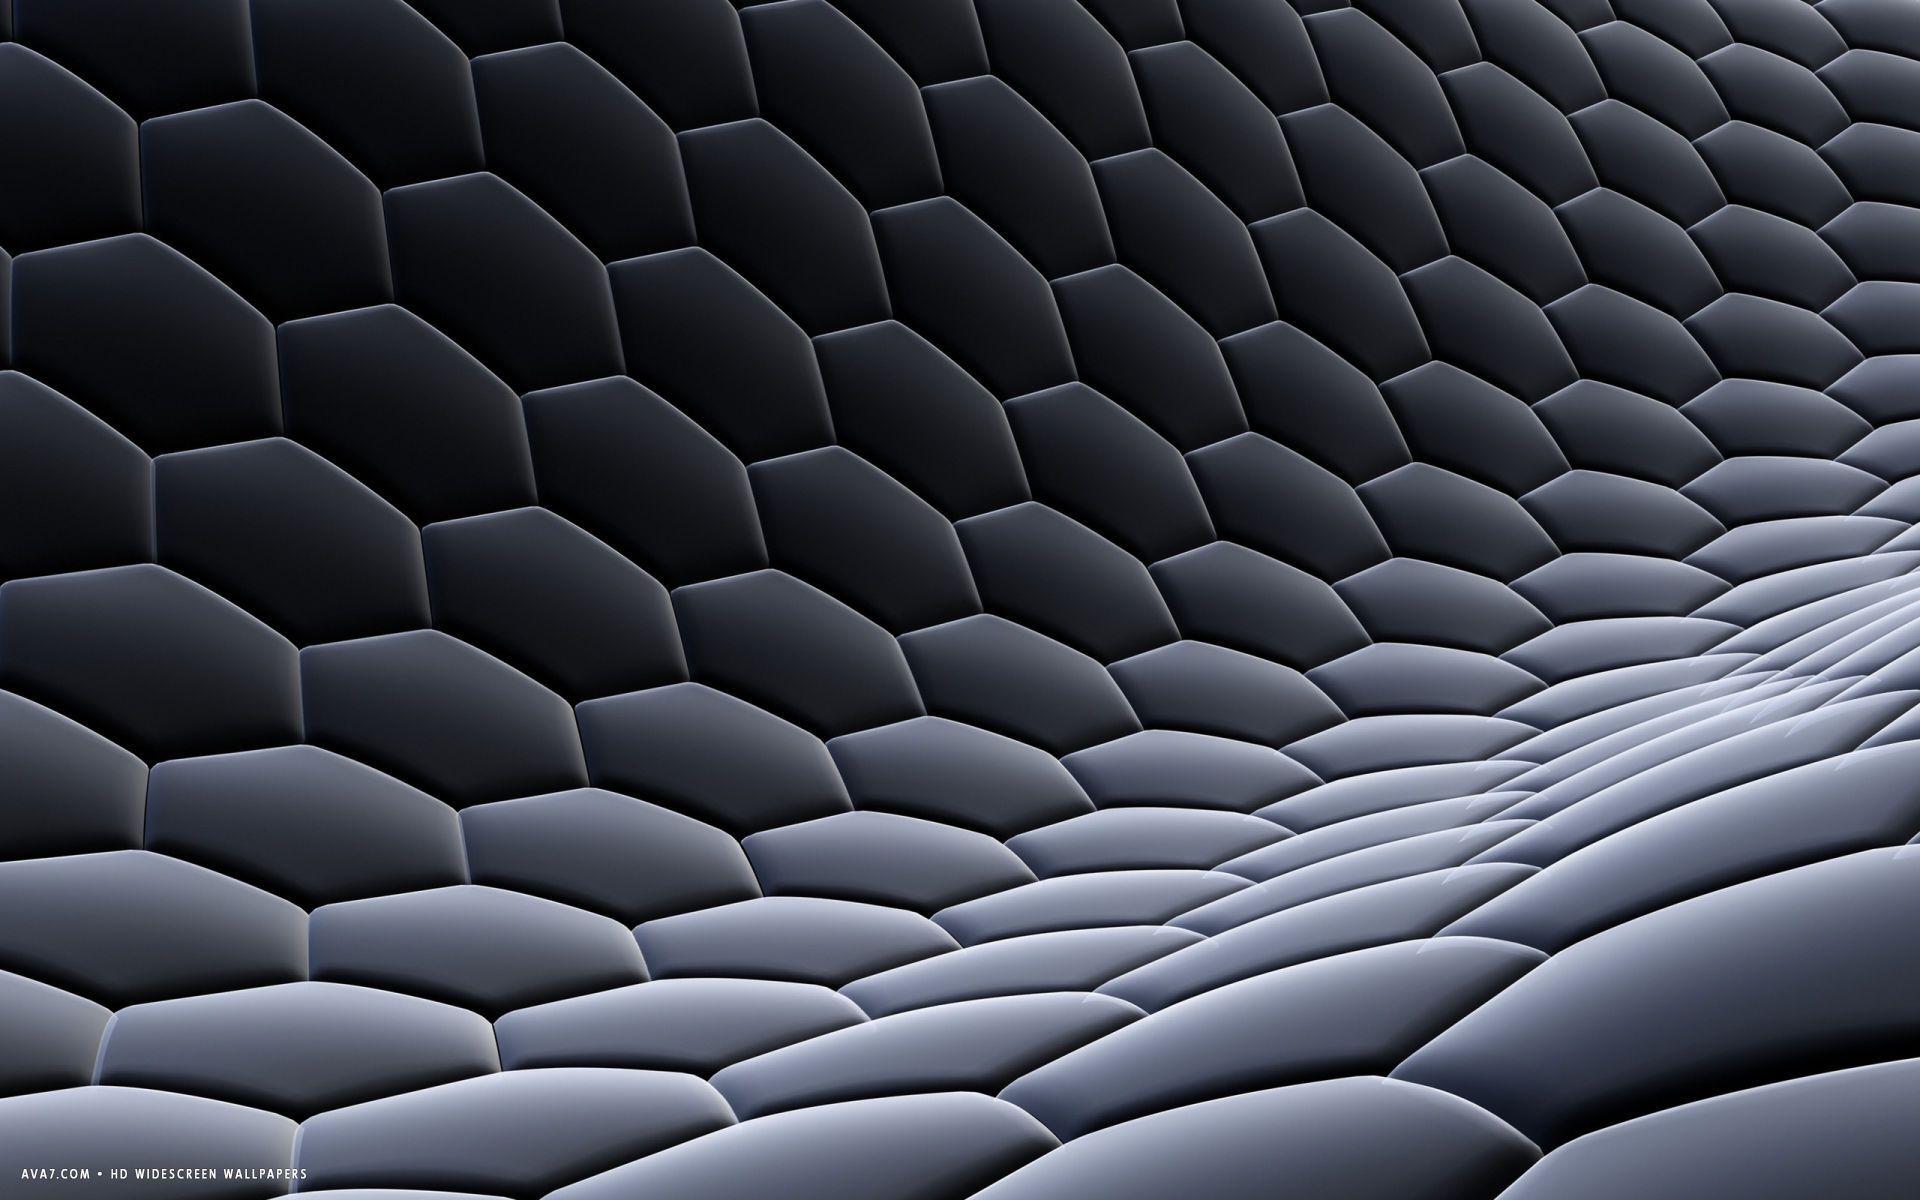 3d Hexagon Texture Fabric Steel Gray Grid Honeycomb Hd Widescreen